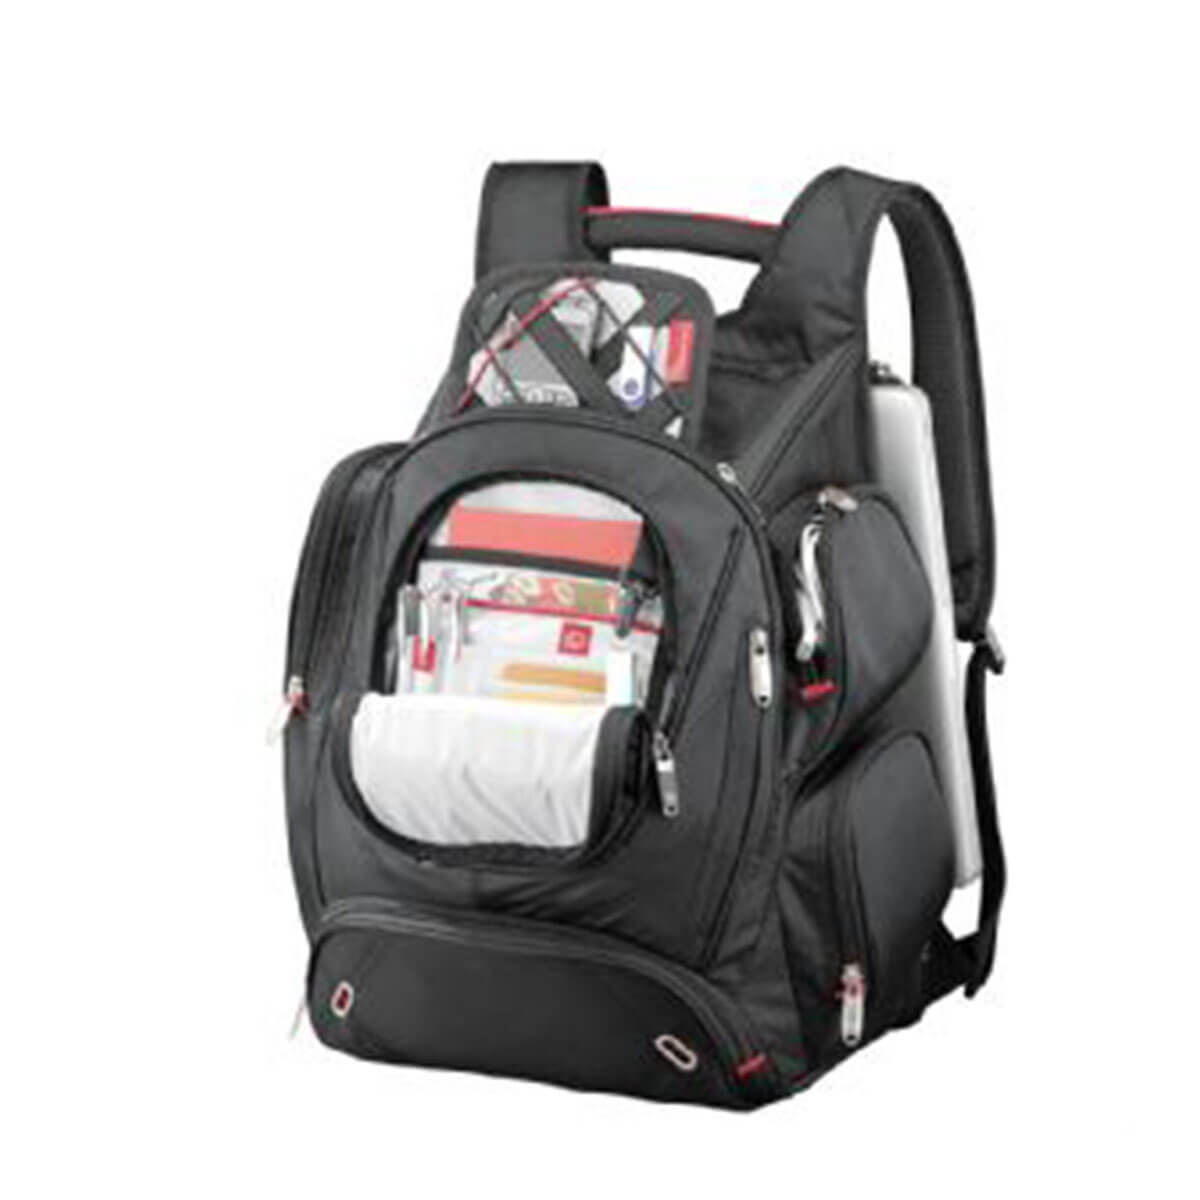 Elleven Checkpoint-Friendly Compu-Backpack-Black.